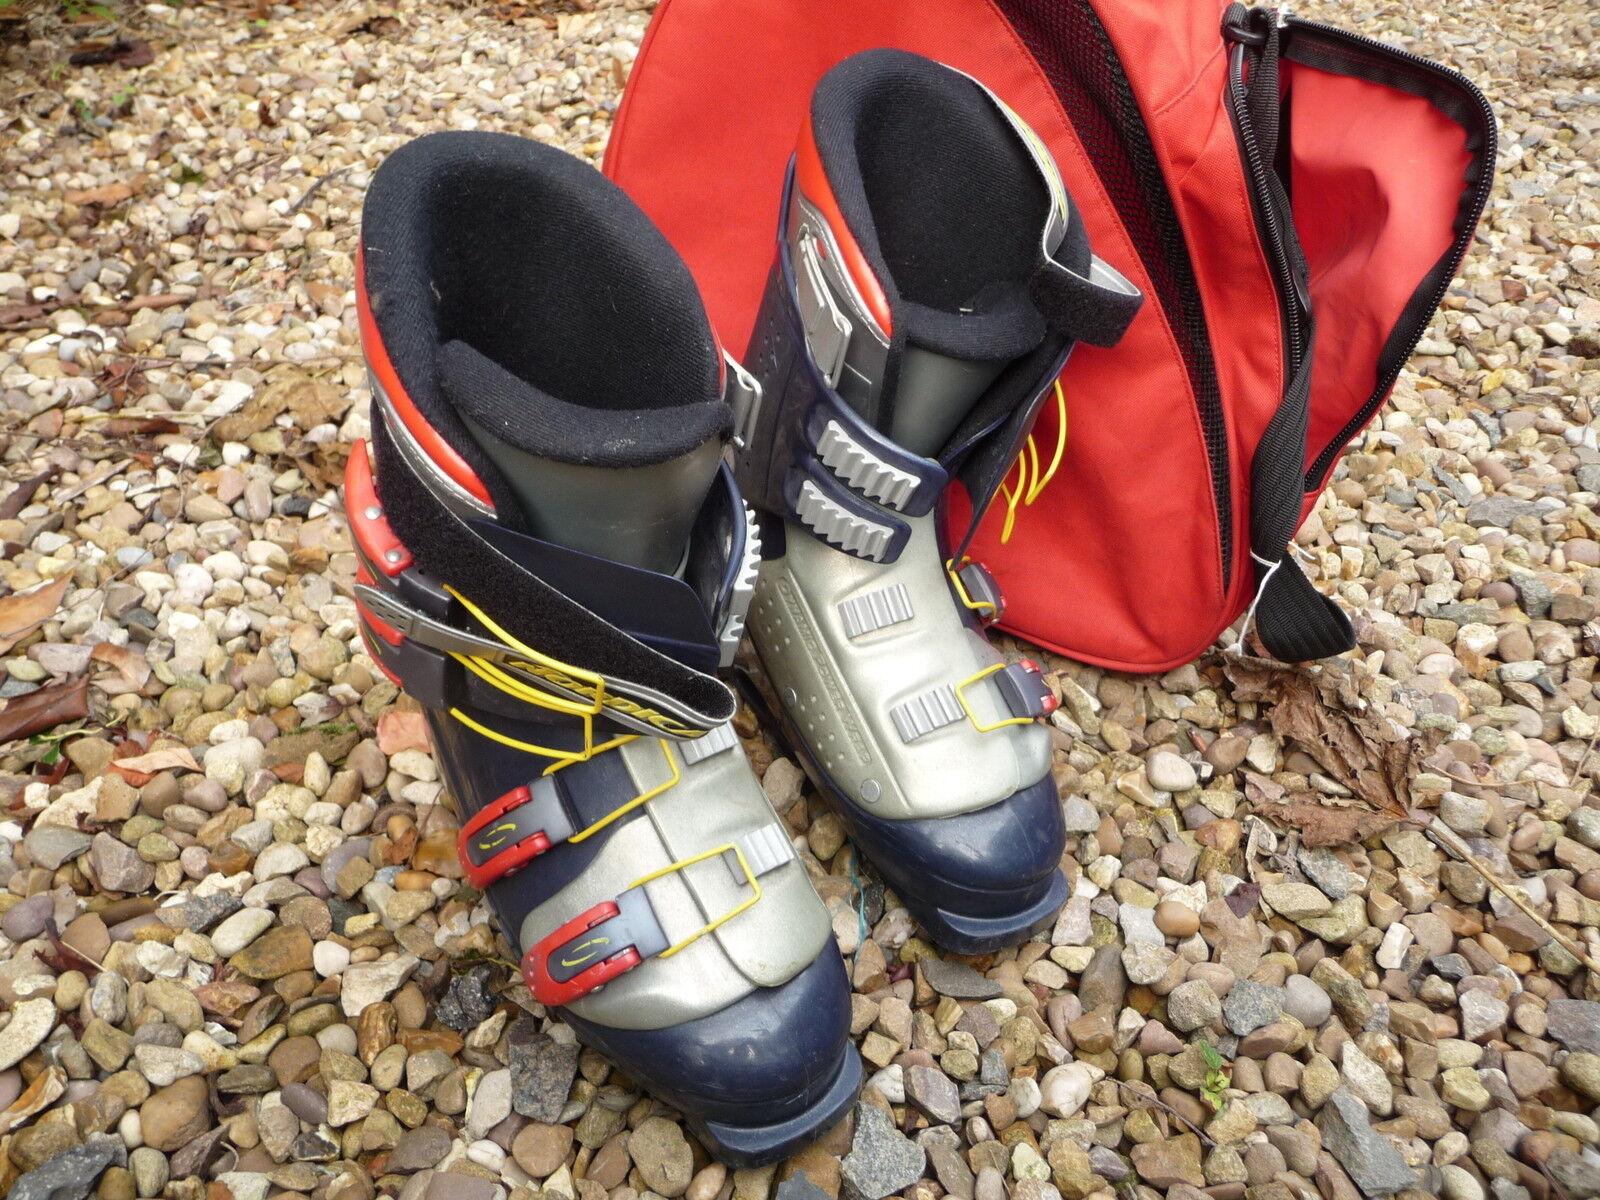 Ski  boots NORDICA greenECH 55 size 7 eu 41 + red bag